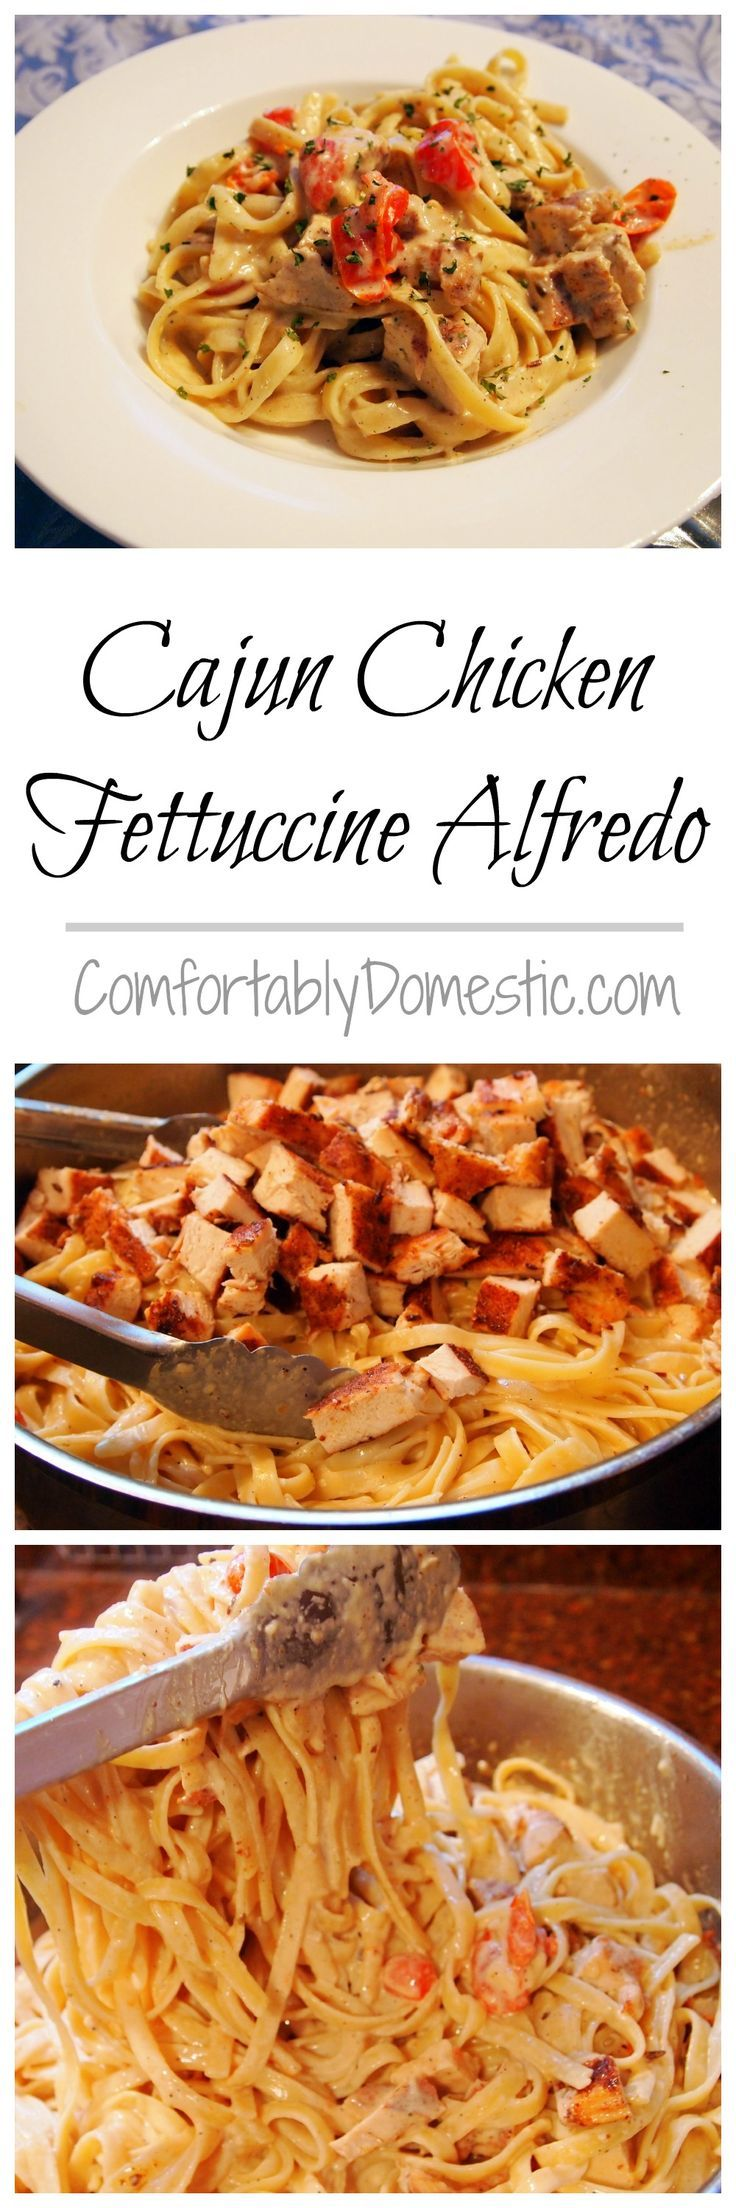 My go-to comfort dinner. Use rotisserie chicken to make it FAST. Cajun-Chicken-Fettuccine-Alfredo-Pasta